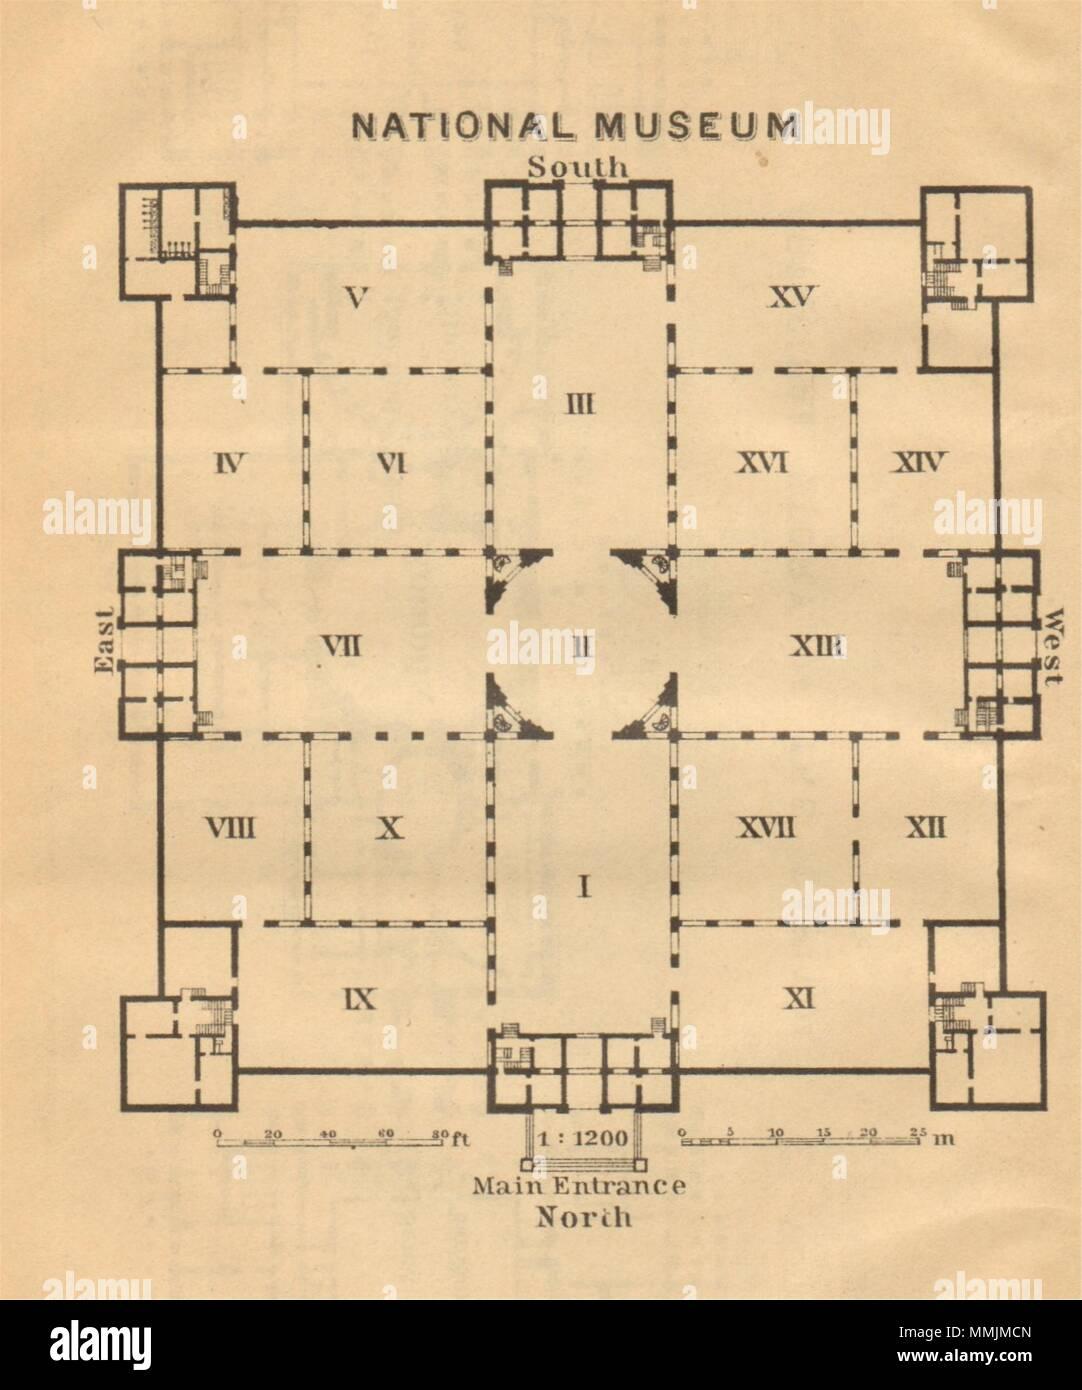 Smithsonian Washington Dc Map.National Museum Floorplan Washington Dc Smithsonian Institution